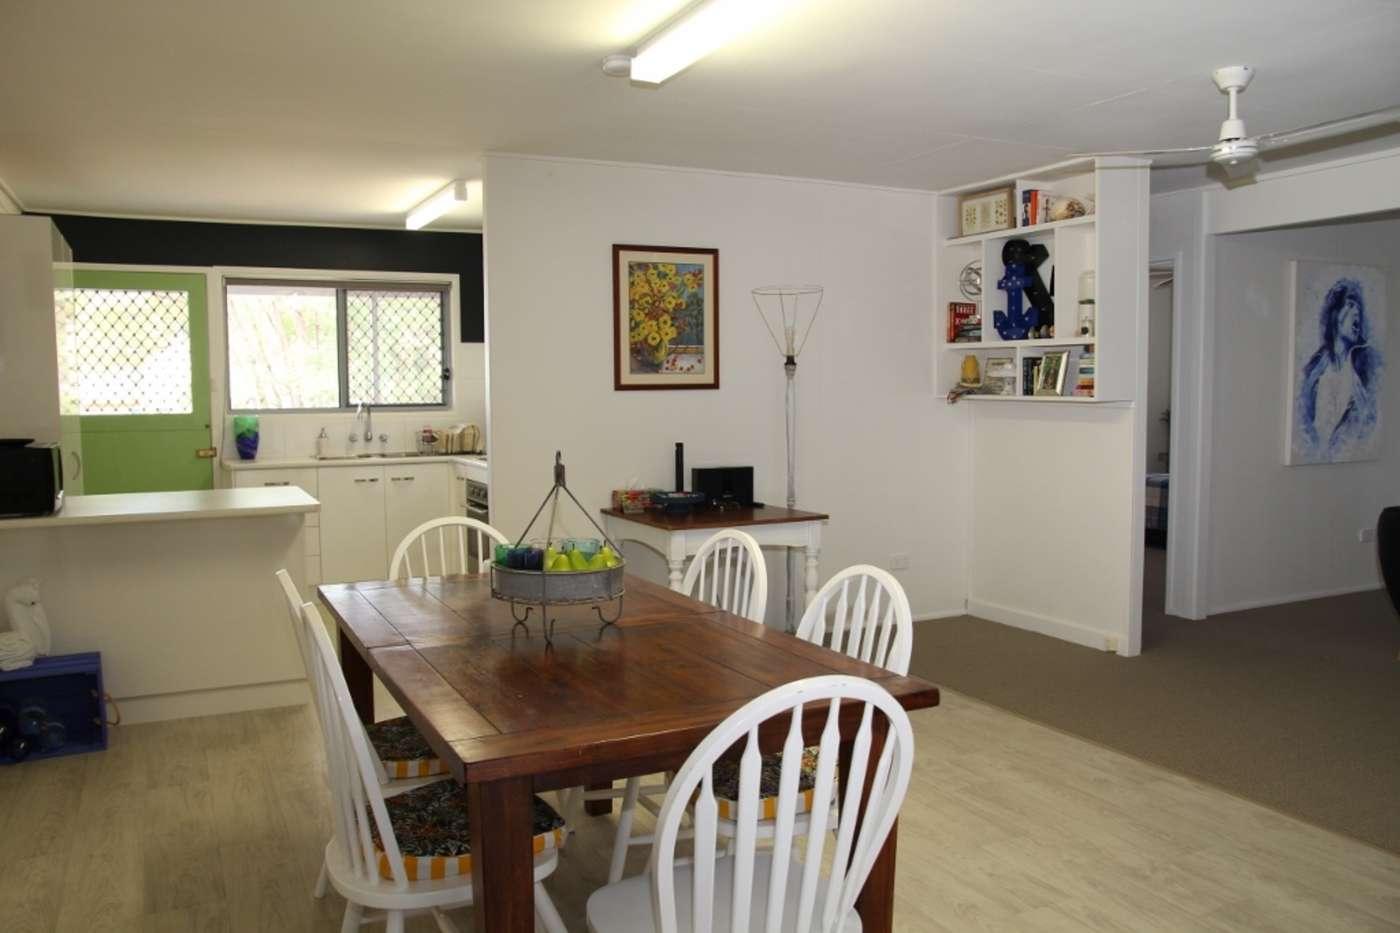 Main view of Homely unit listing, 1/20 Murray Street, Woorim, QLD 4507